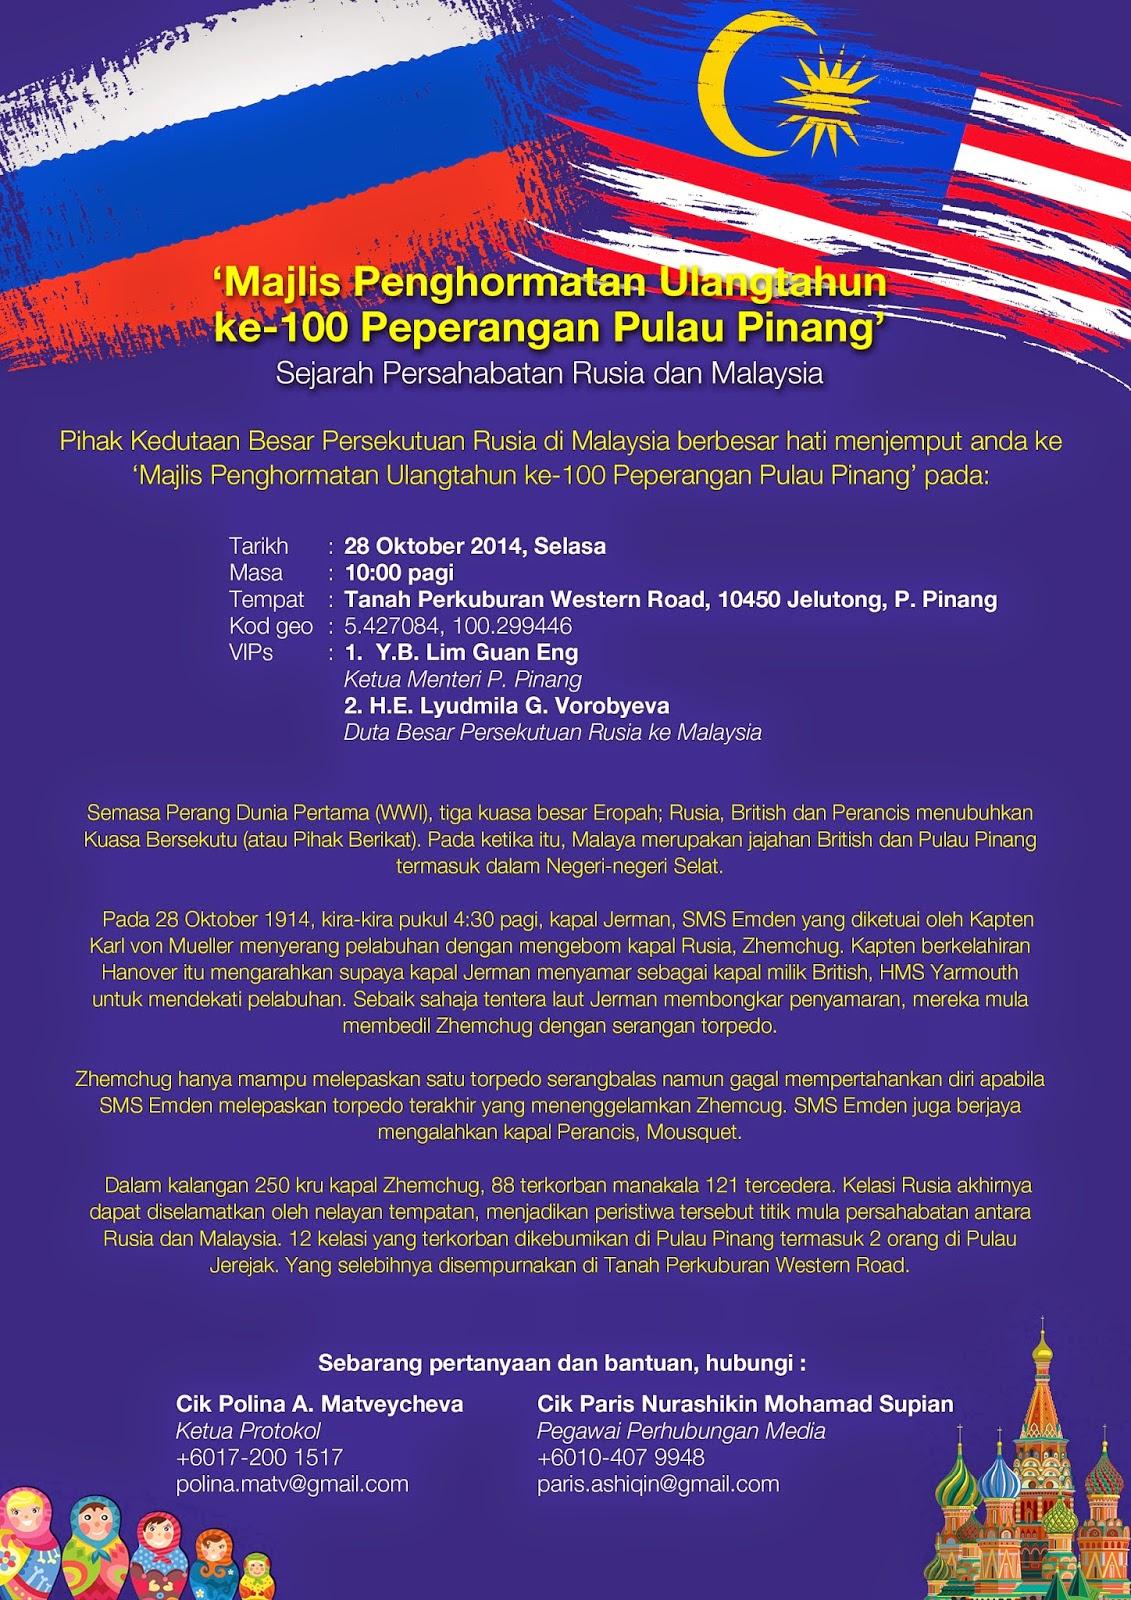 The Battle of Penang 1914 | Majlis Penghormatan Ulangtahun ke-100 Peperangan Pulau Pinang